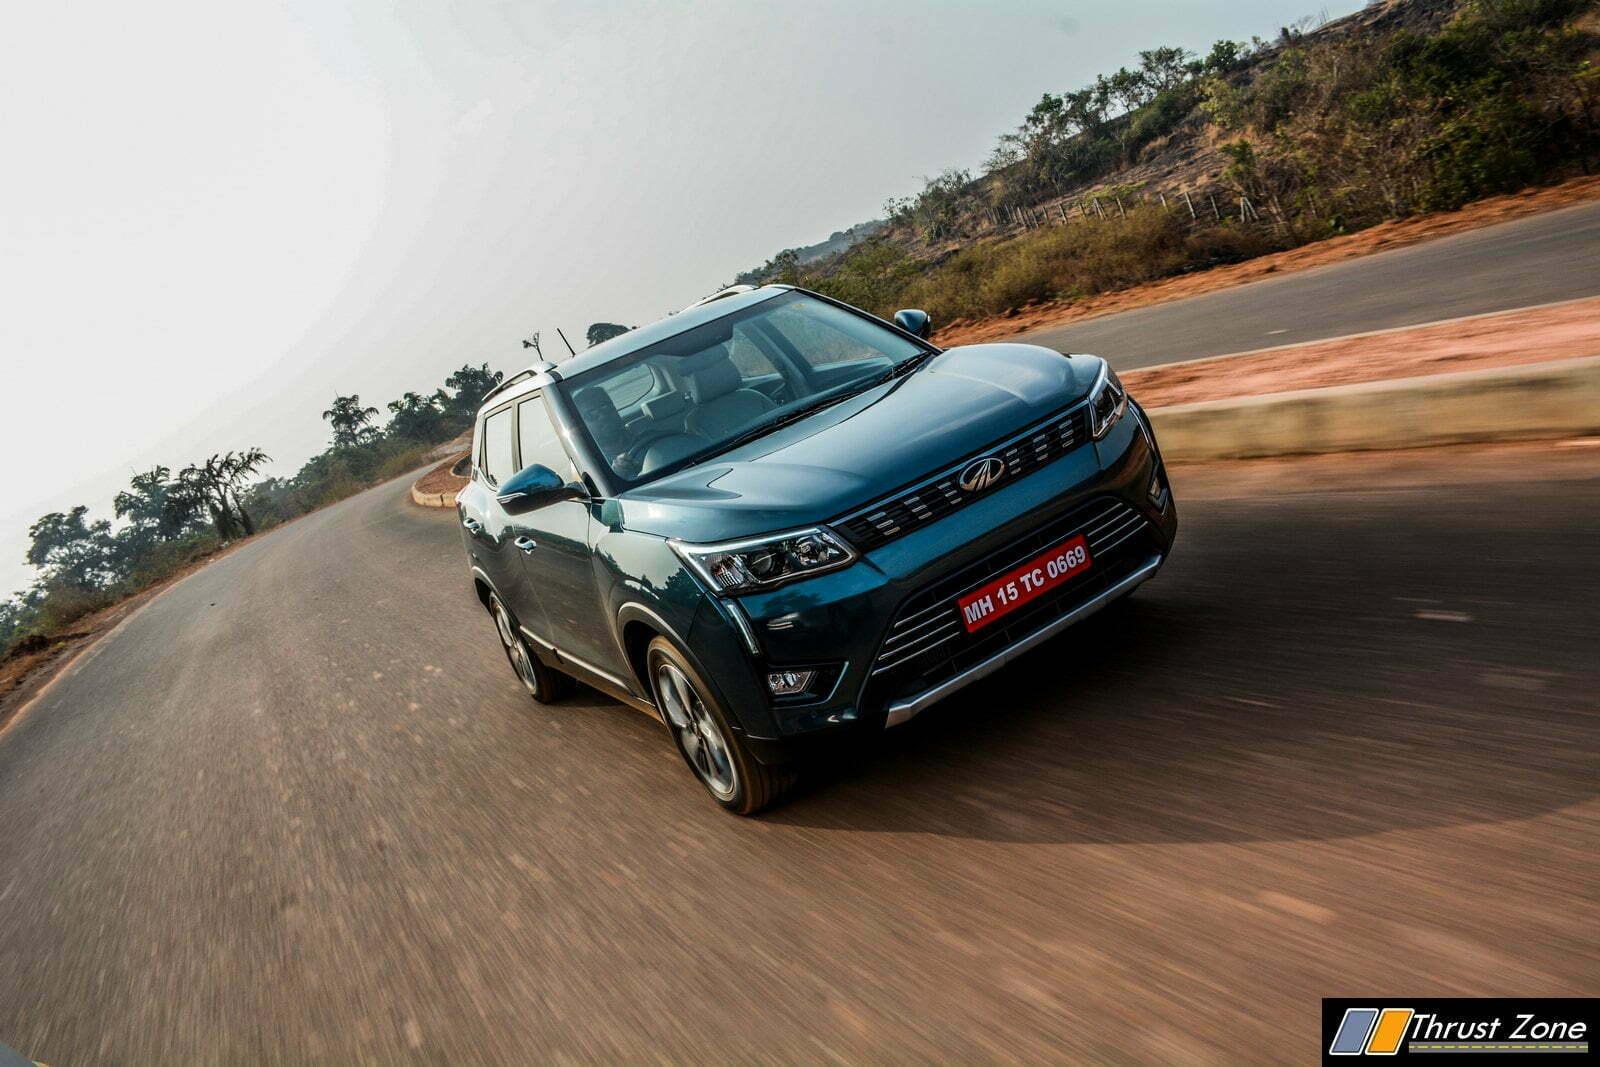 http://www.thrustzone.com/wp-content/uploads/2019/02/Mahindra-XUV-300-Diesel-Review-3.jpg